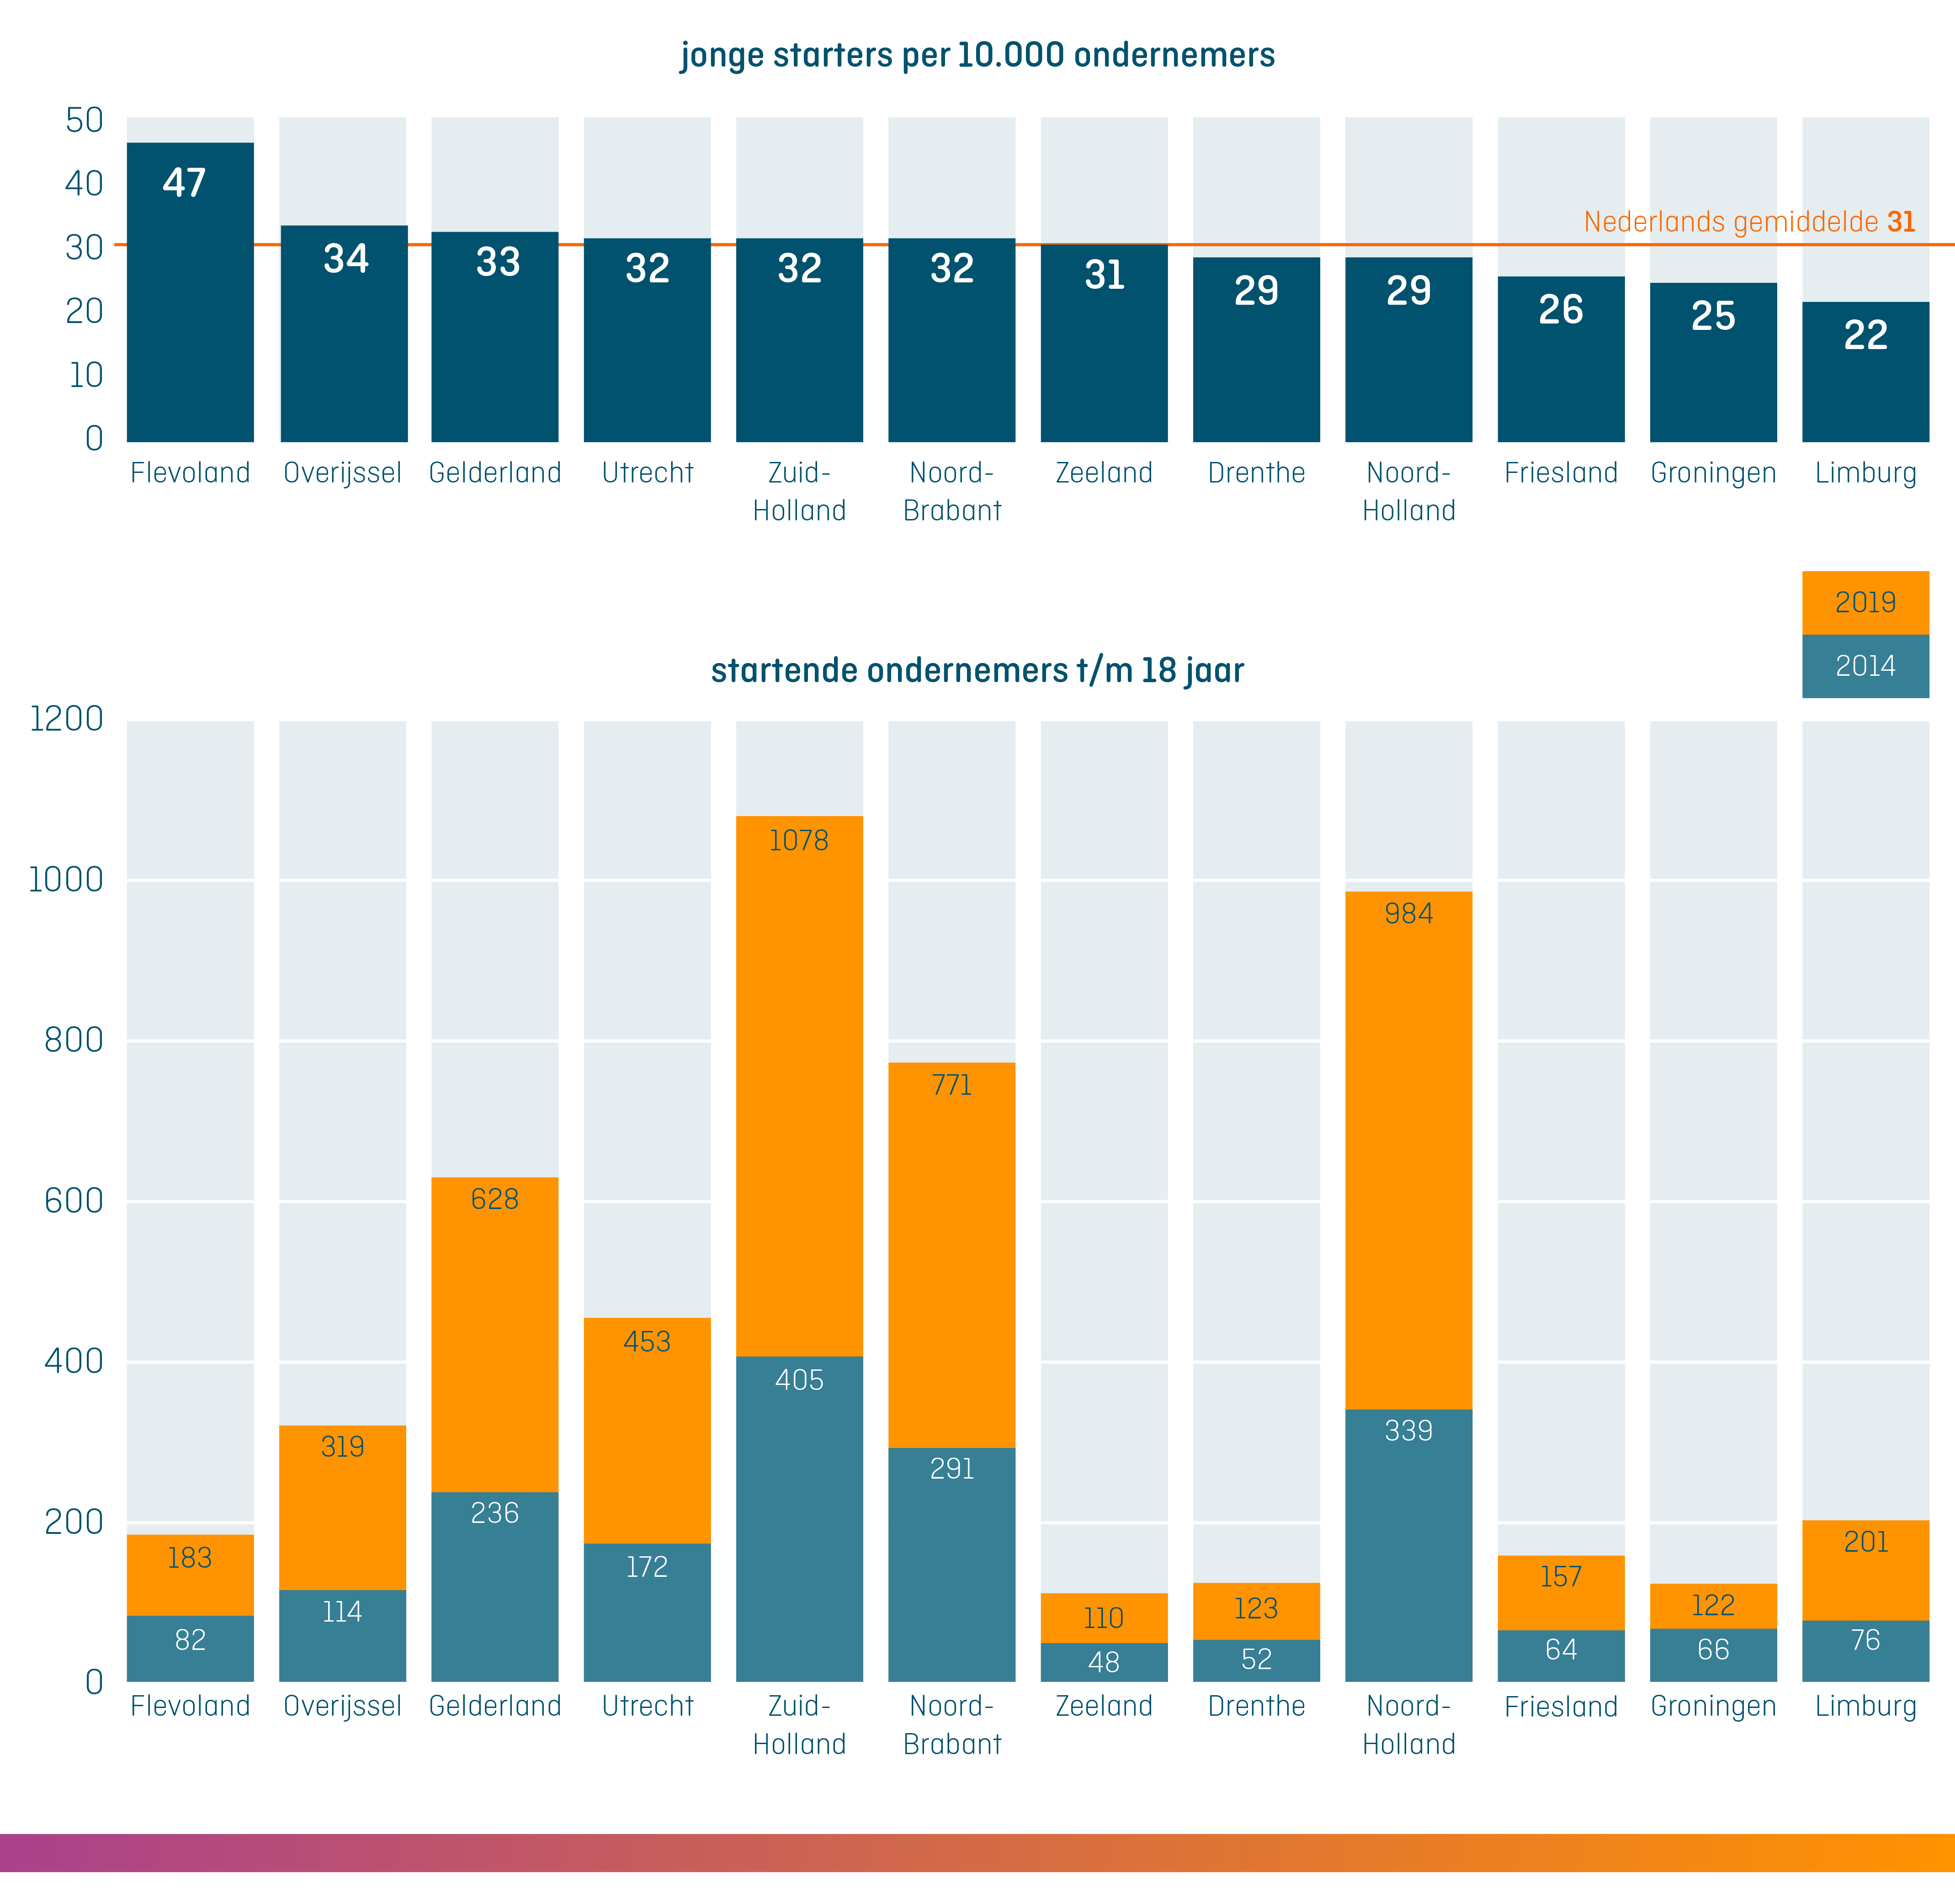 kvk_graphic_jonge_starters_per_10000_ondernemers_en_per_provincie_in_Nederland